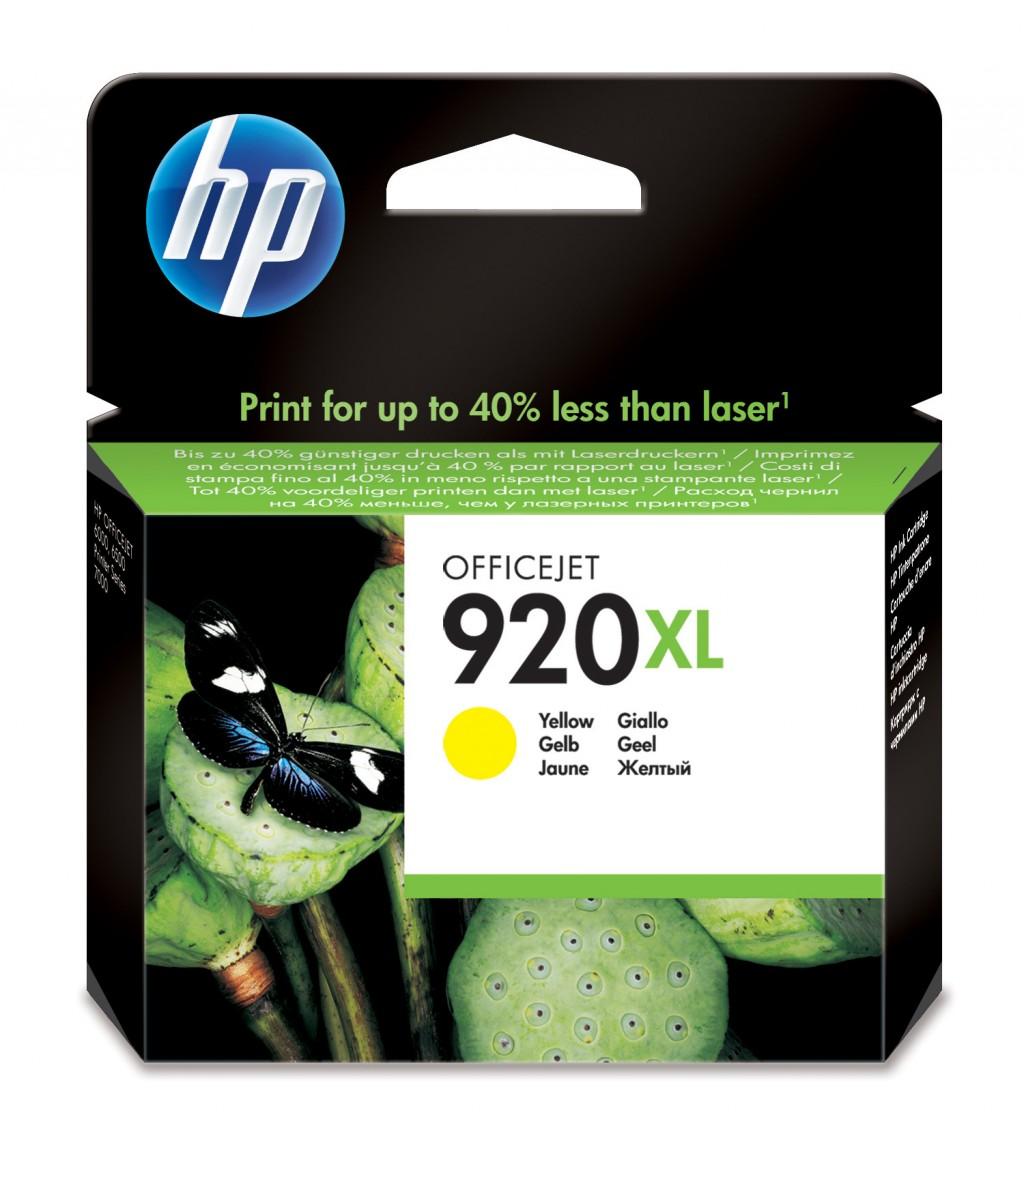 HP CD974AE ink cartridge No. 920XL, yellow, high capacity